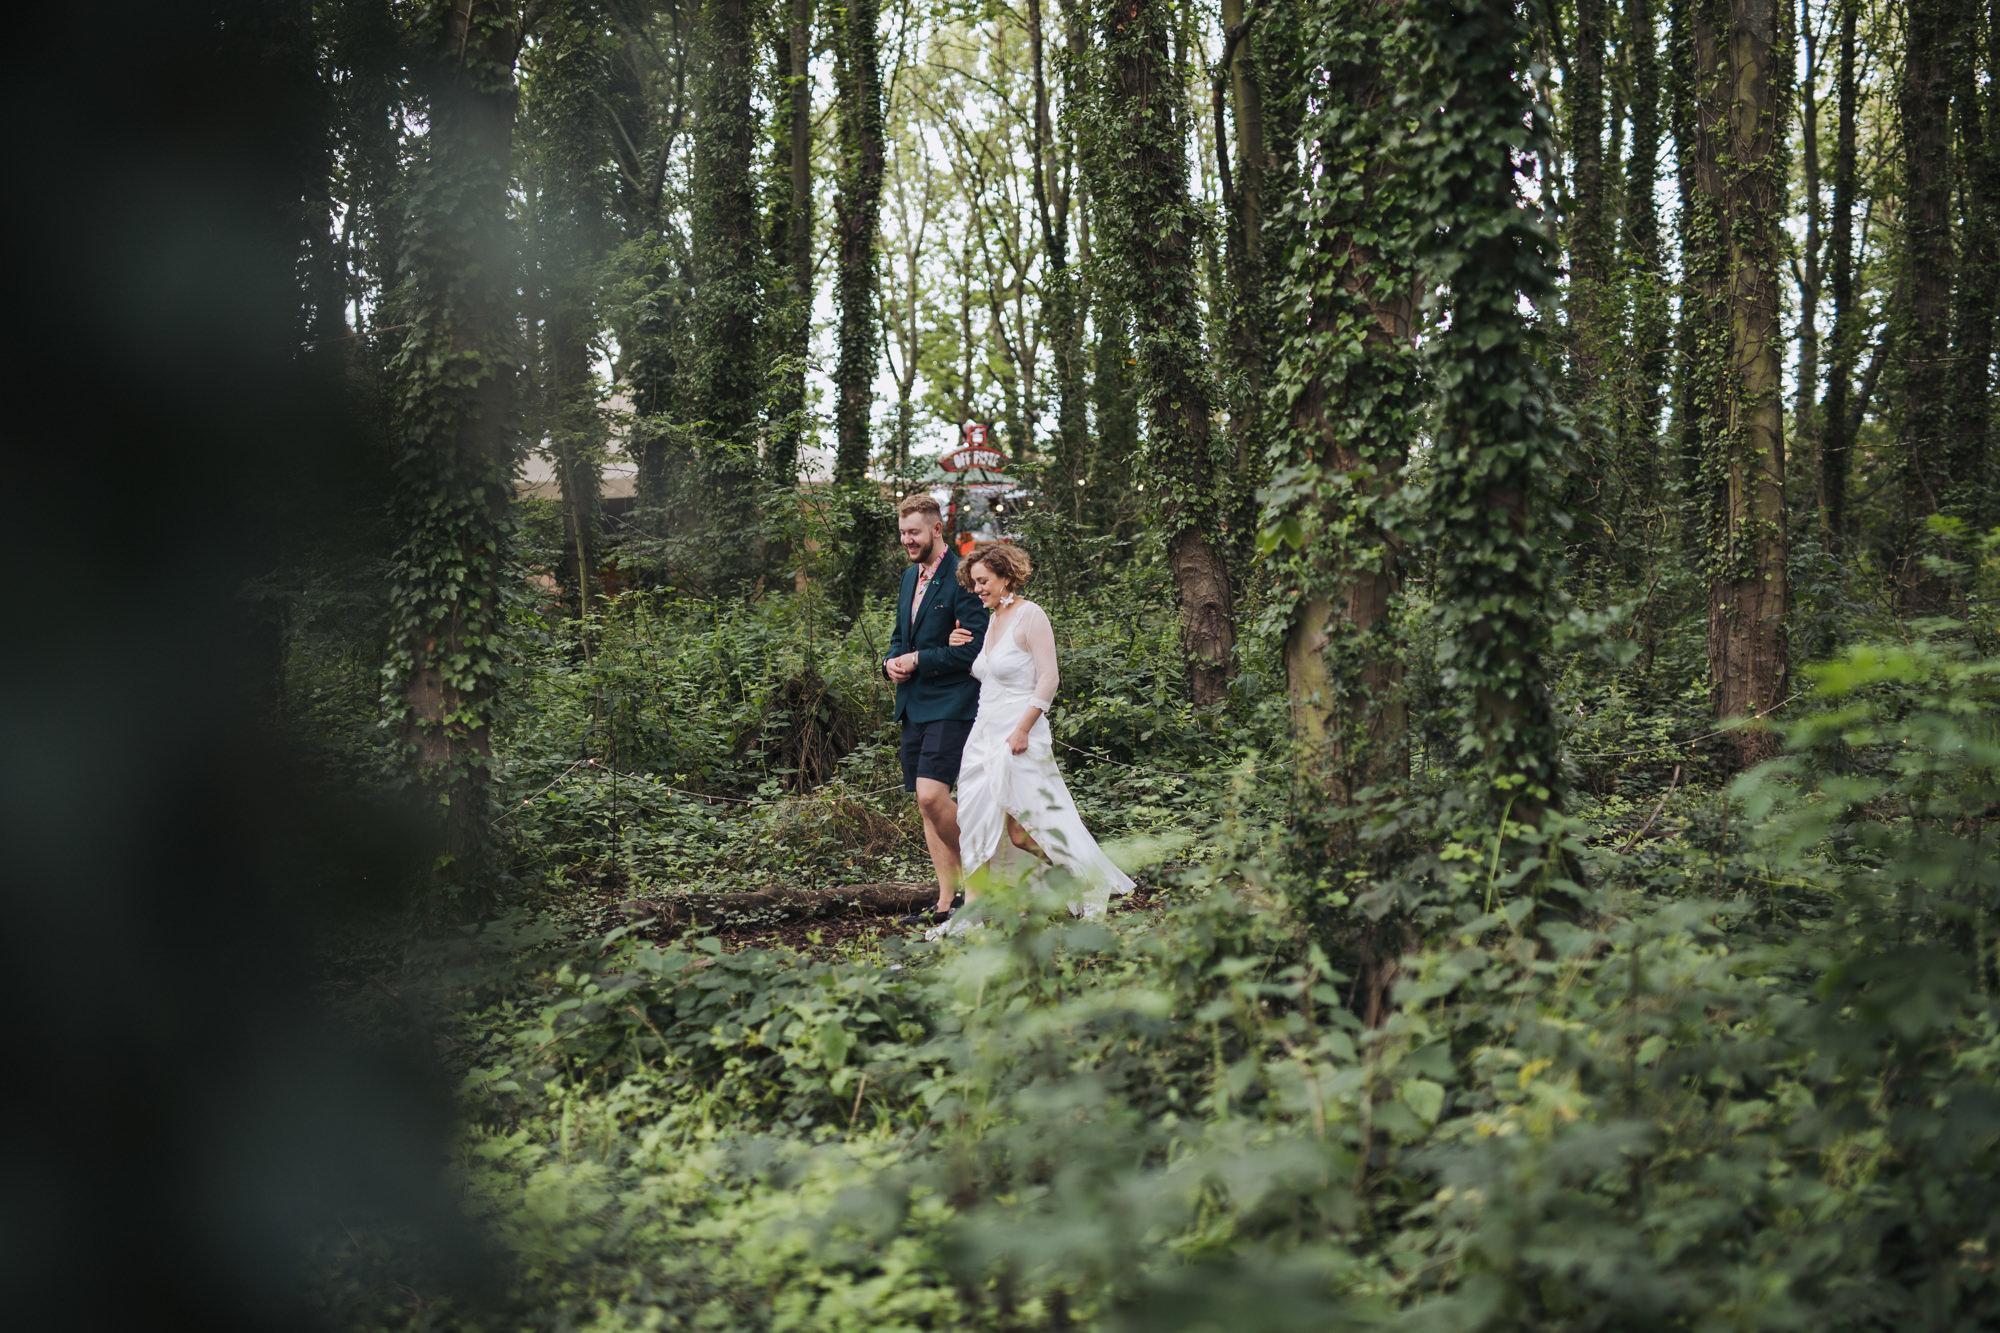 applewood wedding photographer leeds, yorkshire29.jpg